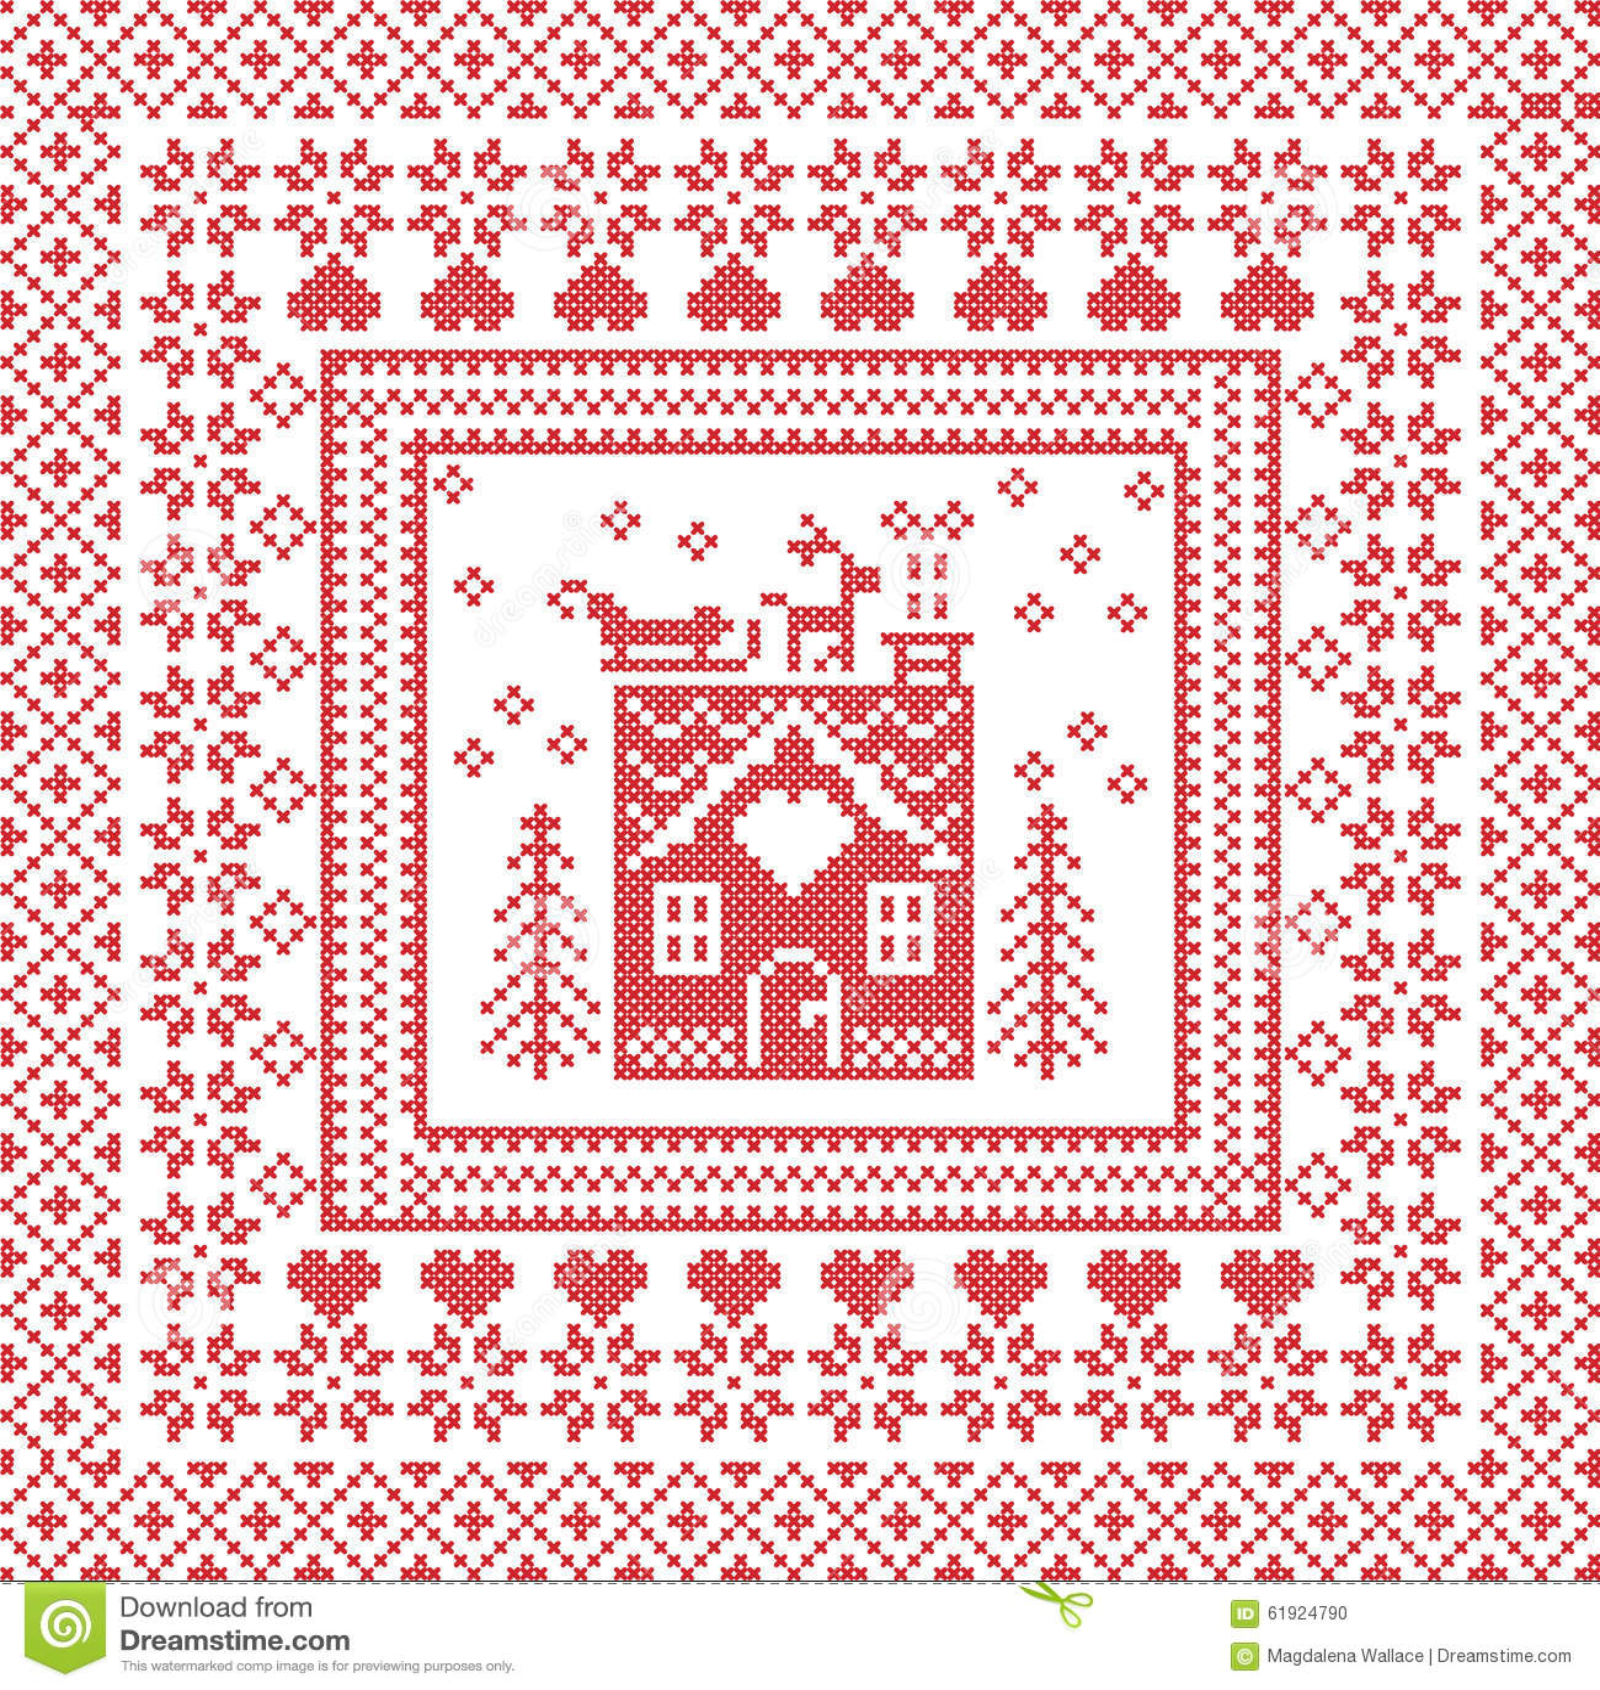 Scandinavian Nordic Winter Stitch, Knitting Pattern In Square, Tile ...